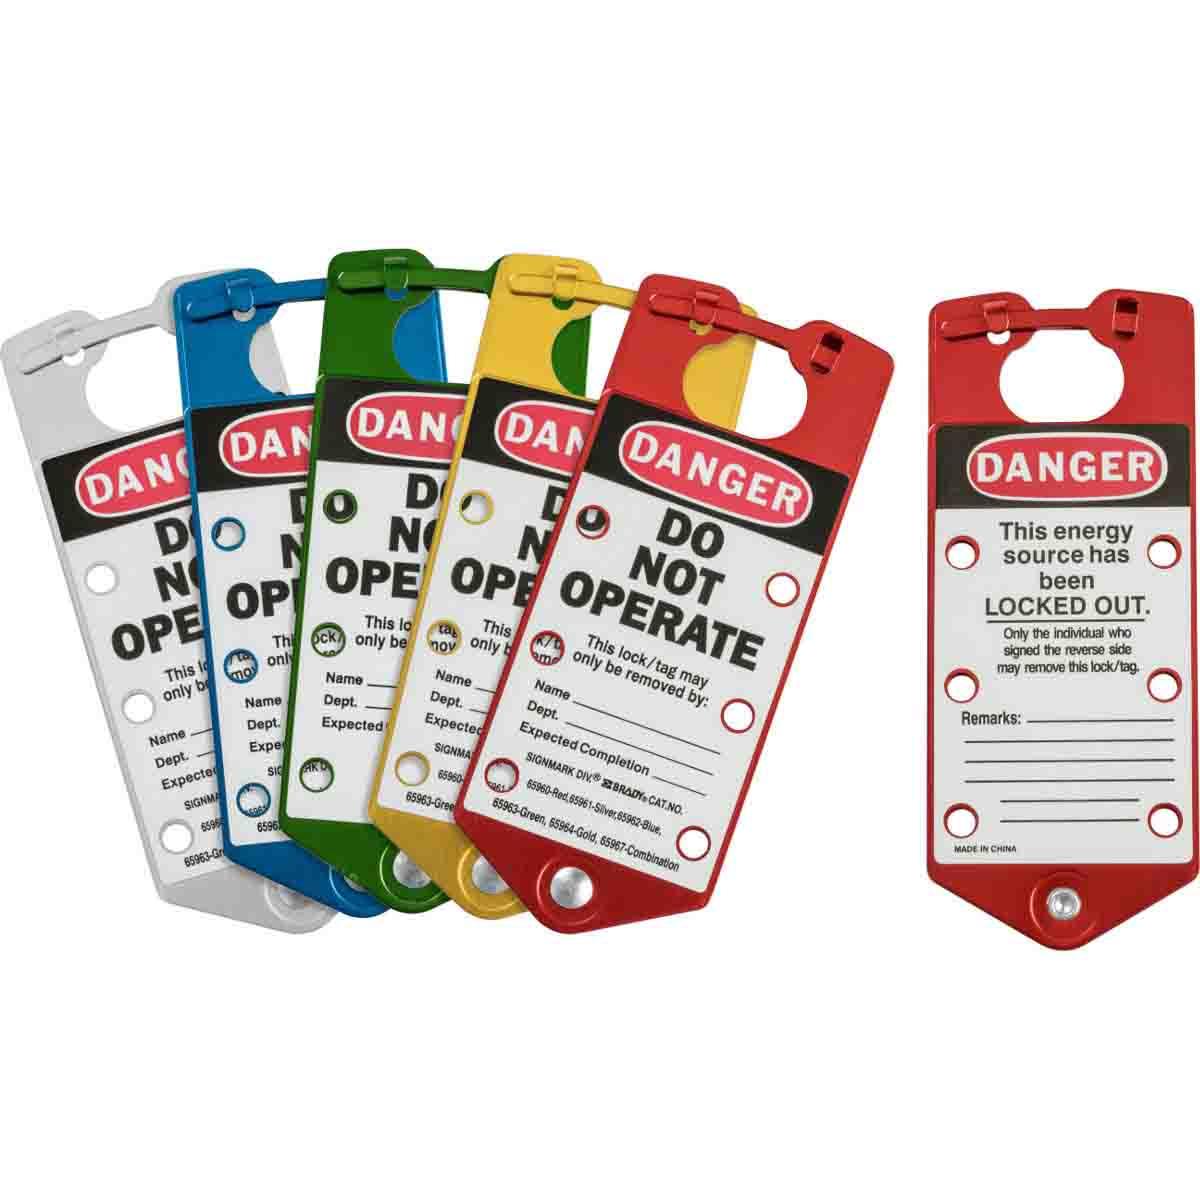 Brady® 65967 Labeled Snap-In Lockout Hasp With Interlocking Tabs, 6 Padlocks, 5/16 in Max Dia Padlock Shackle, Aluminum